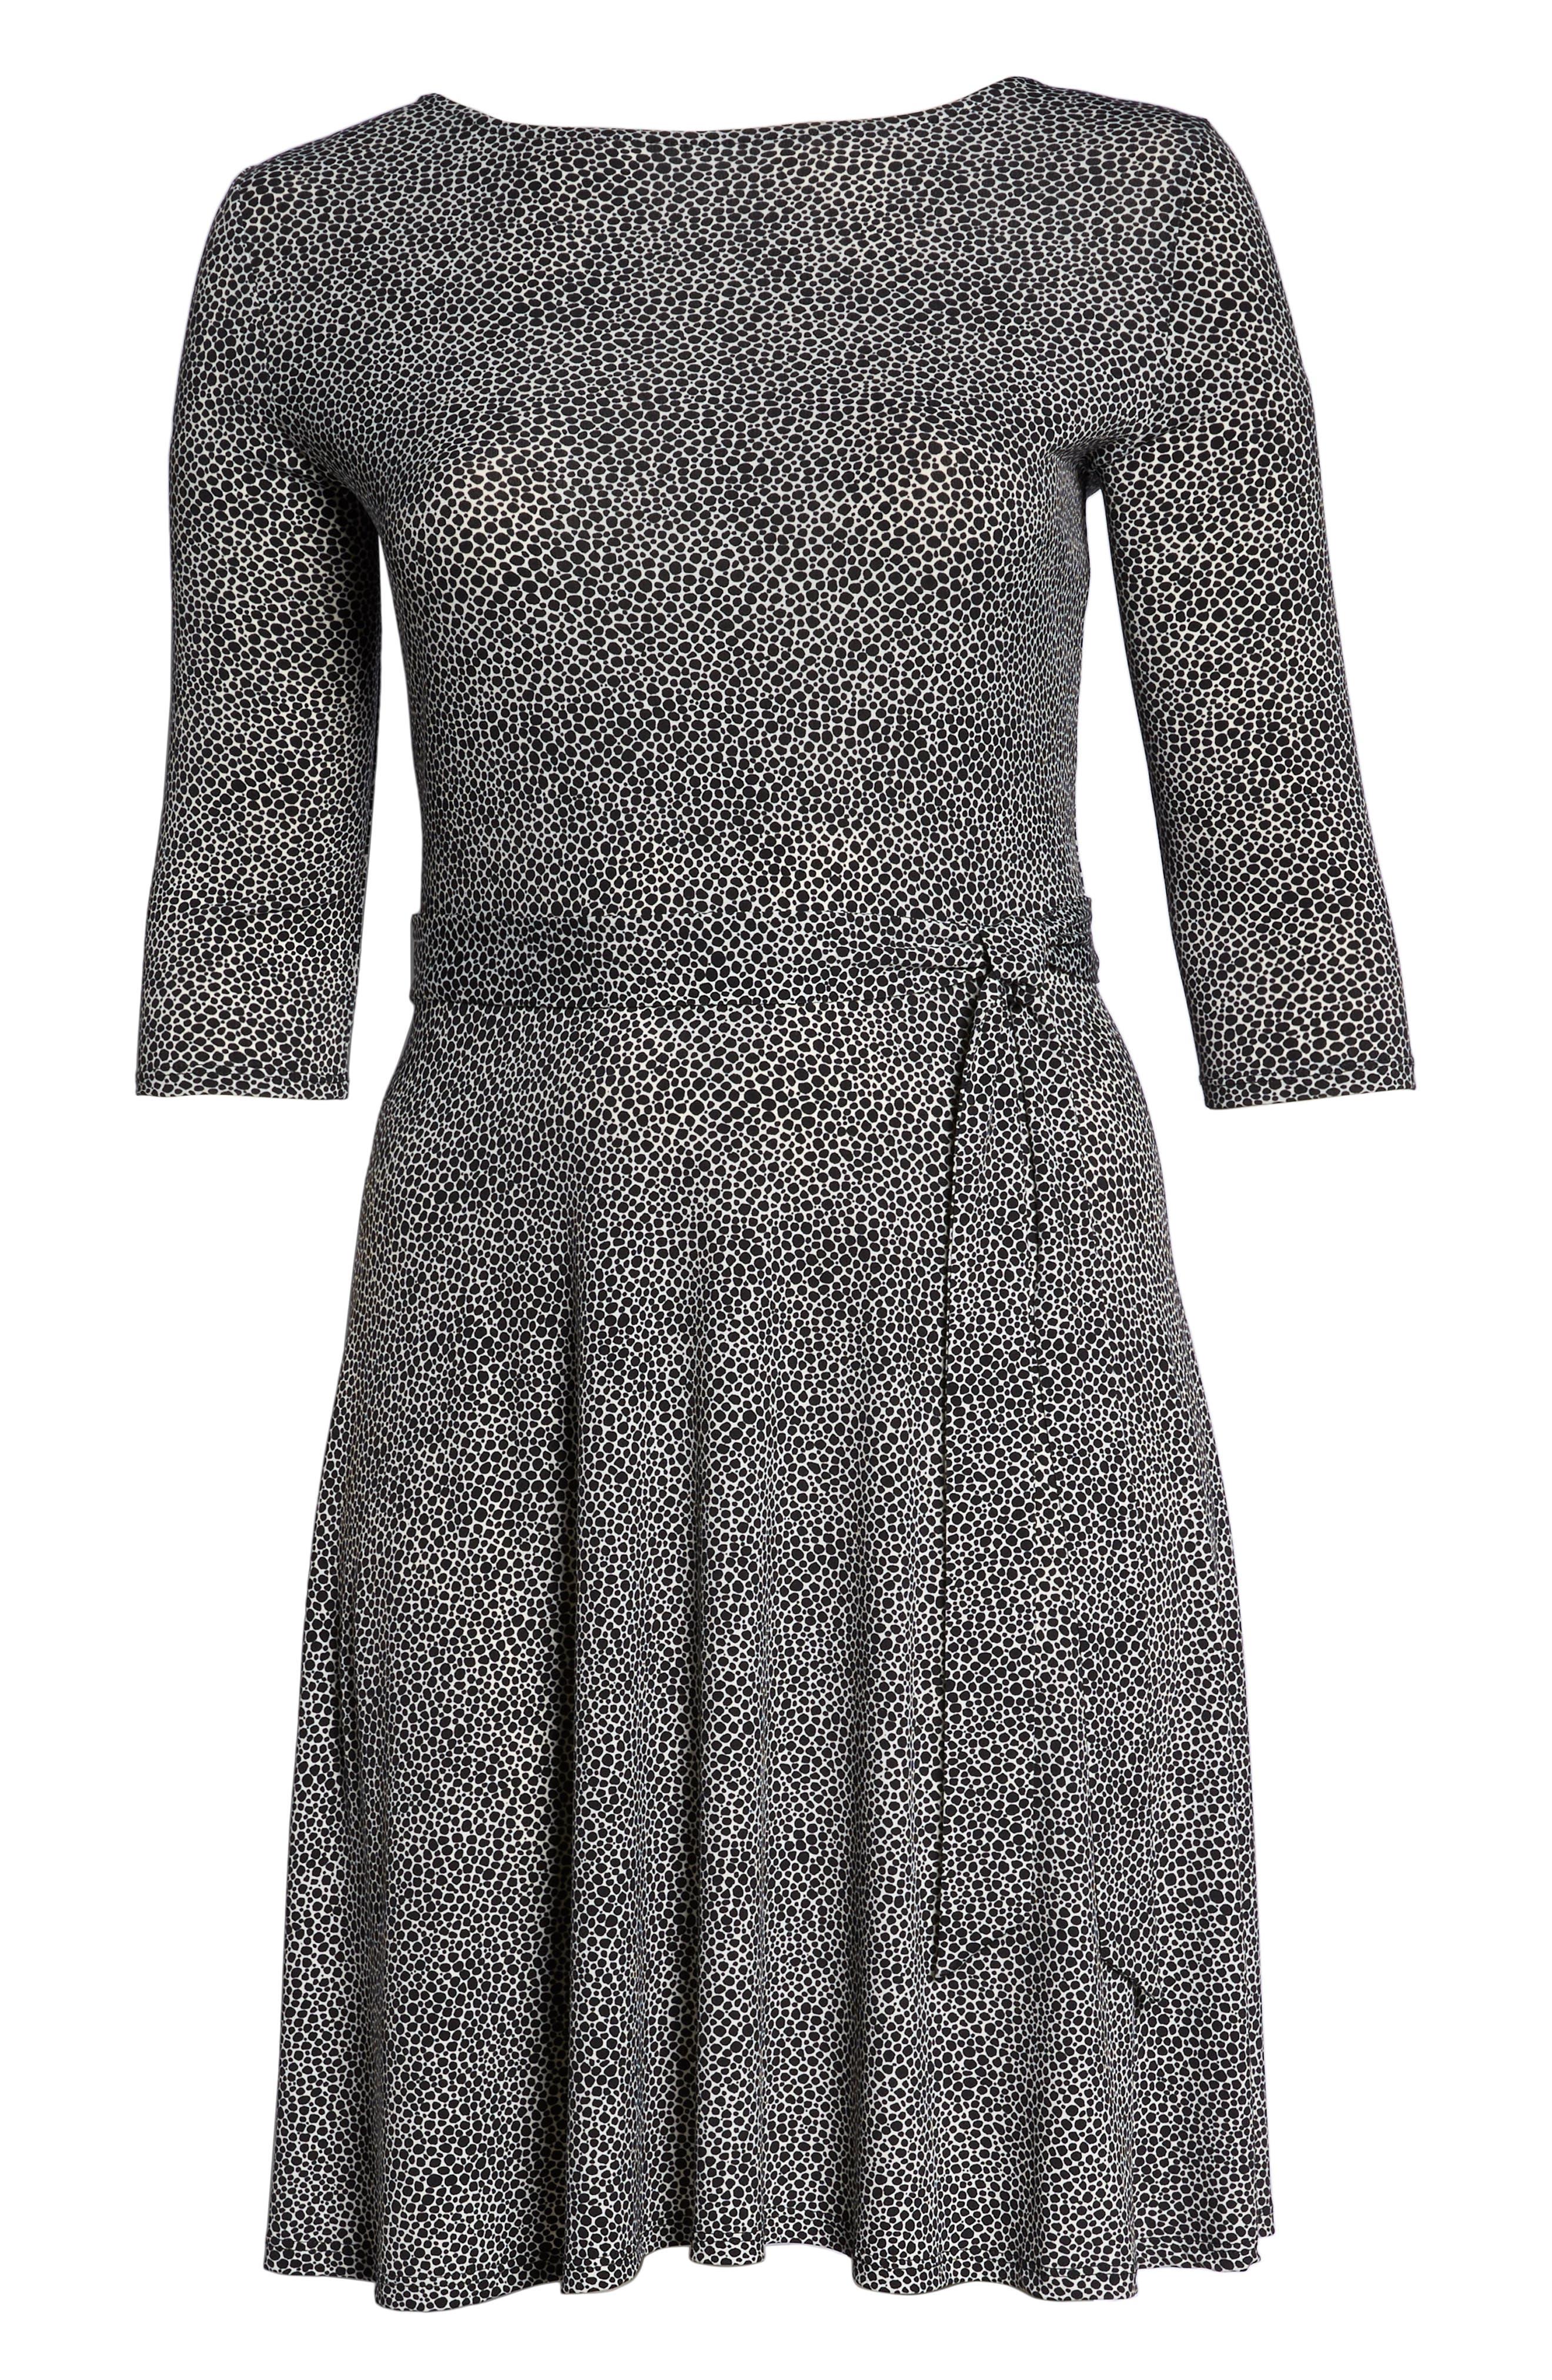 Llana Stretch Jersey Dress,                             Alternate thumbnail 7, color,                             PEBBLE